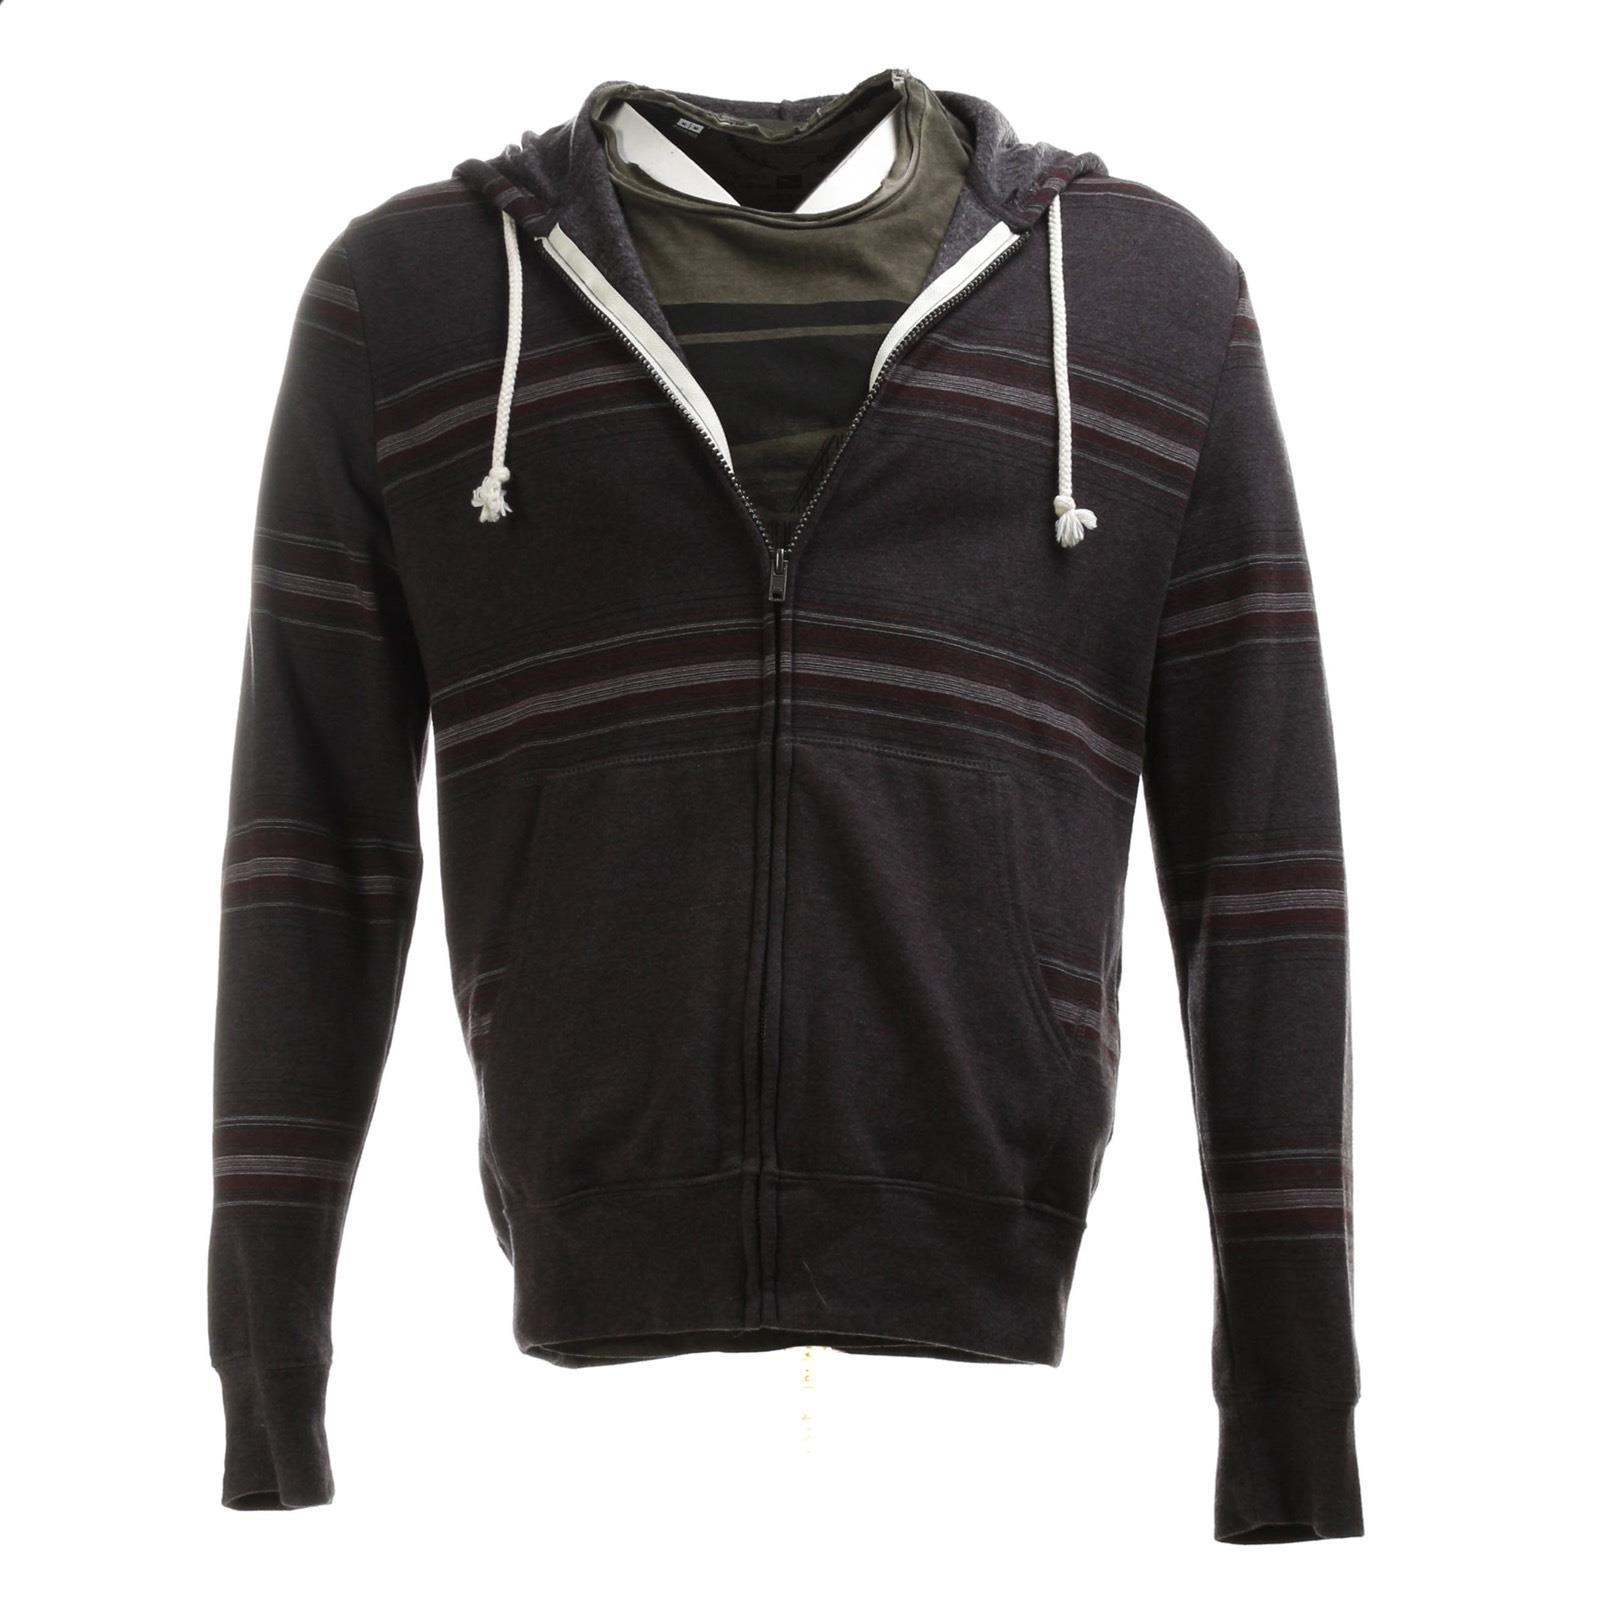 OITNB-CO-Bayley-Alan-Aisenberg-Screen-Worn-Sweatshirt-amp-Shirt-Ep-413